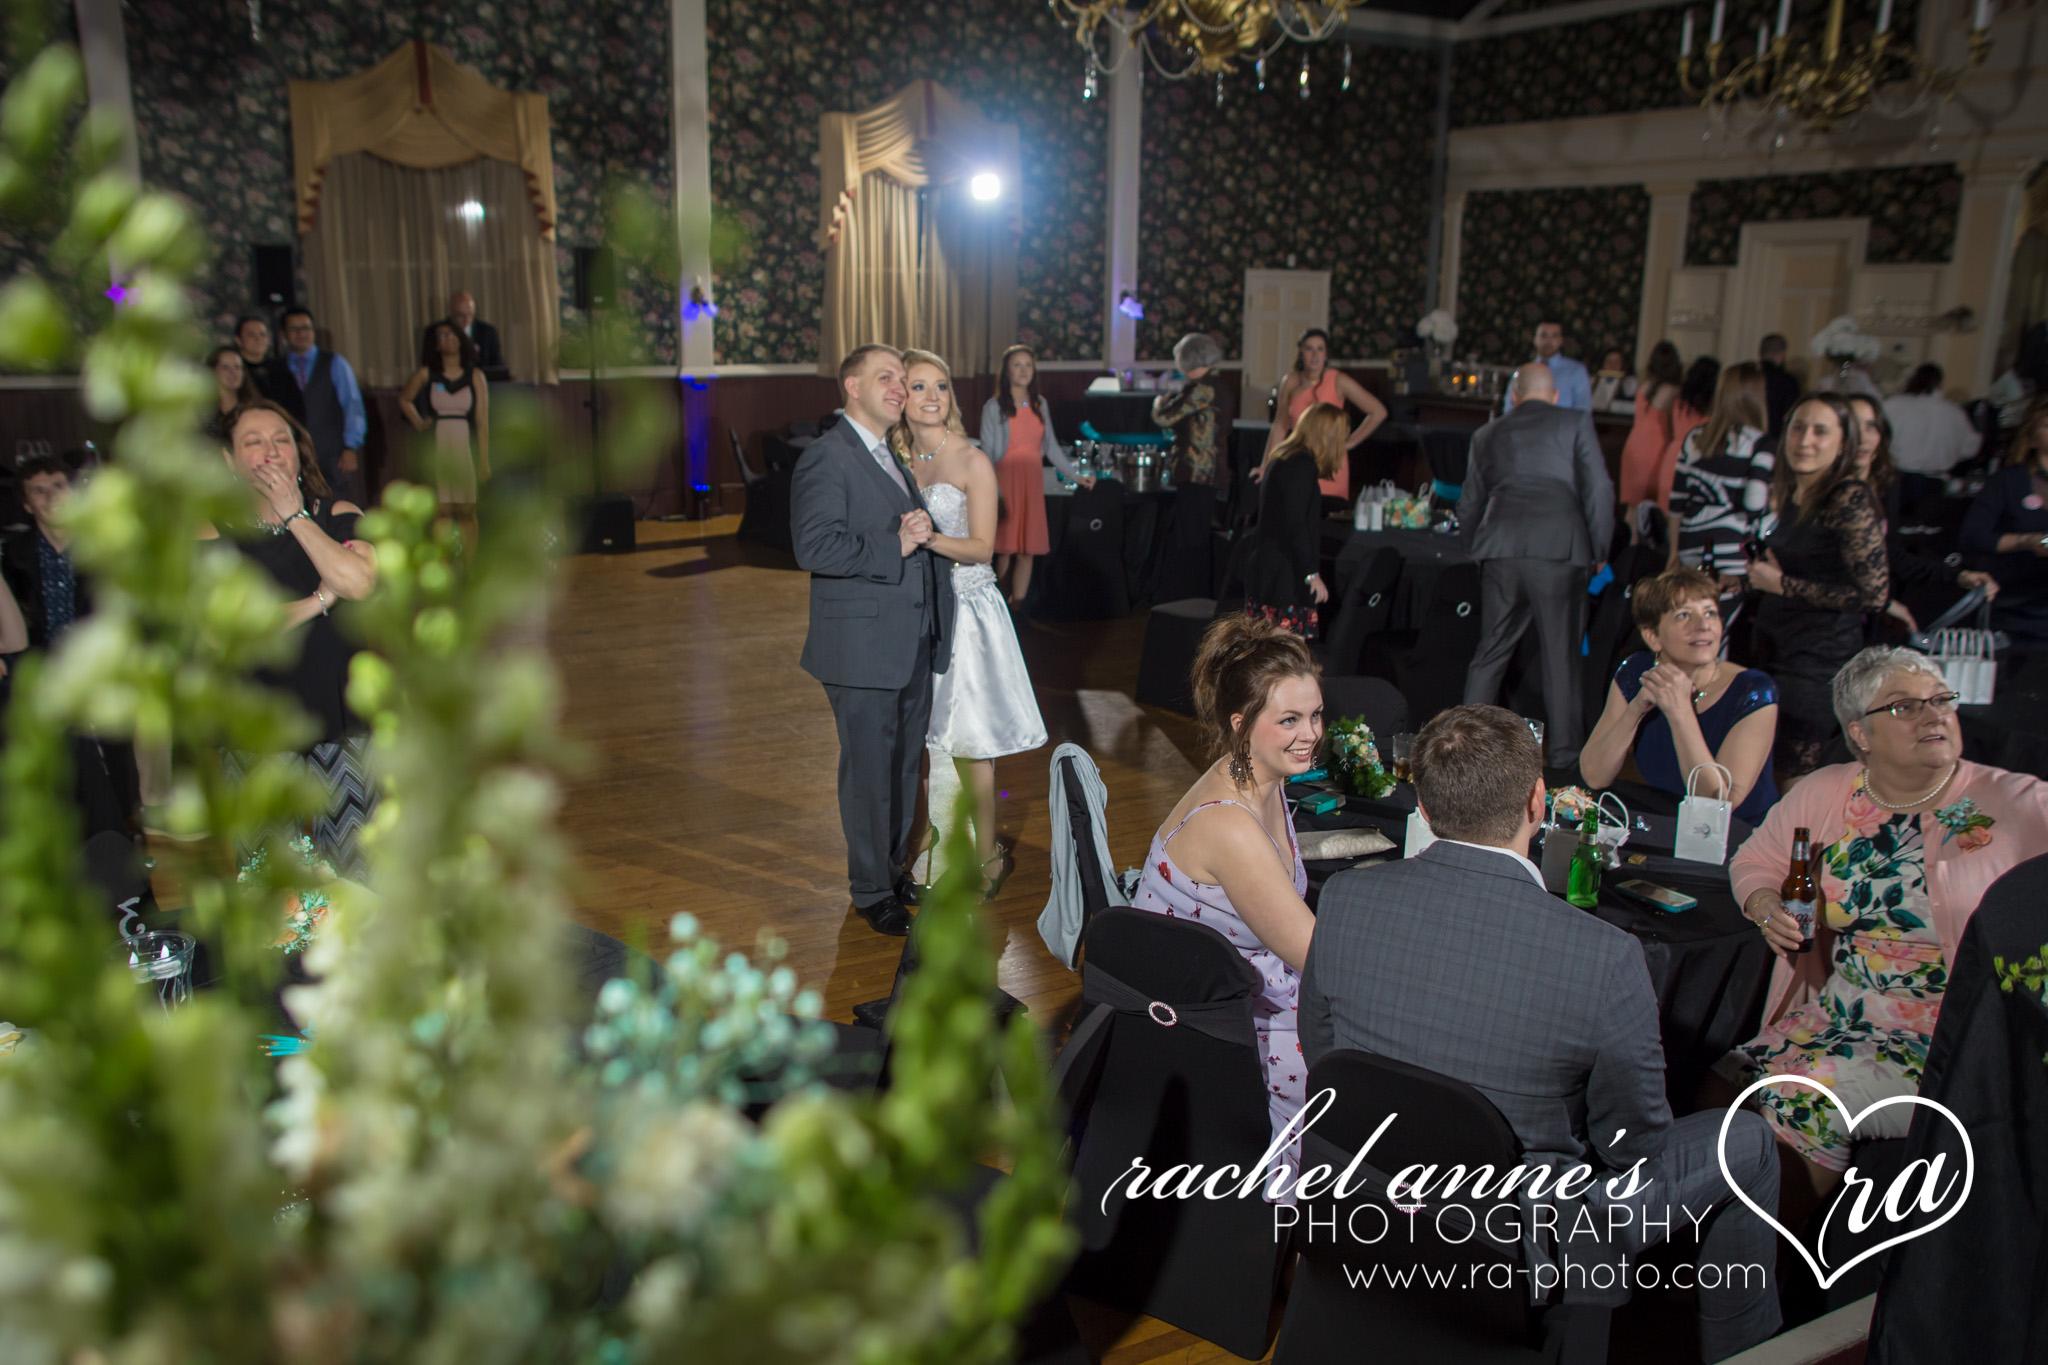 076-JKS-WEDDINGS-THE-FRANKLIN-PA.jpg